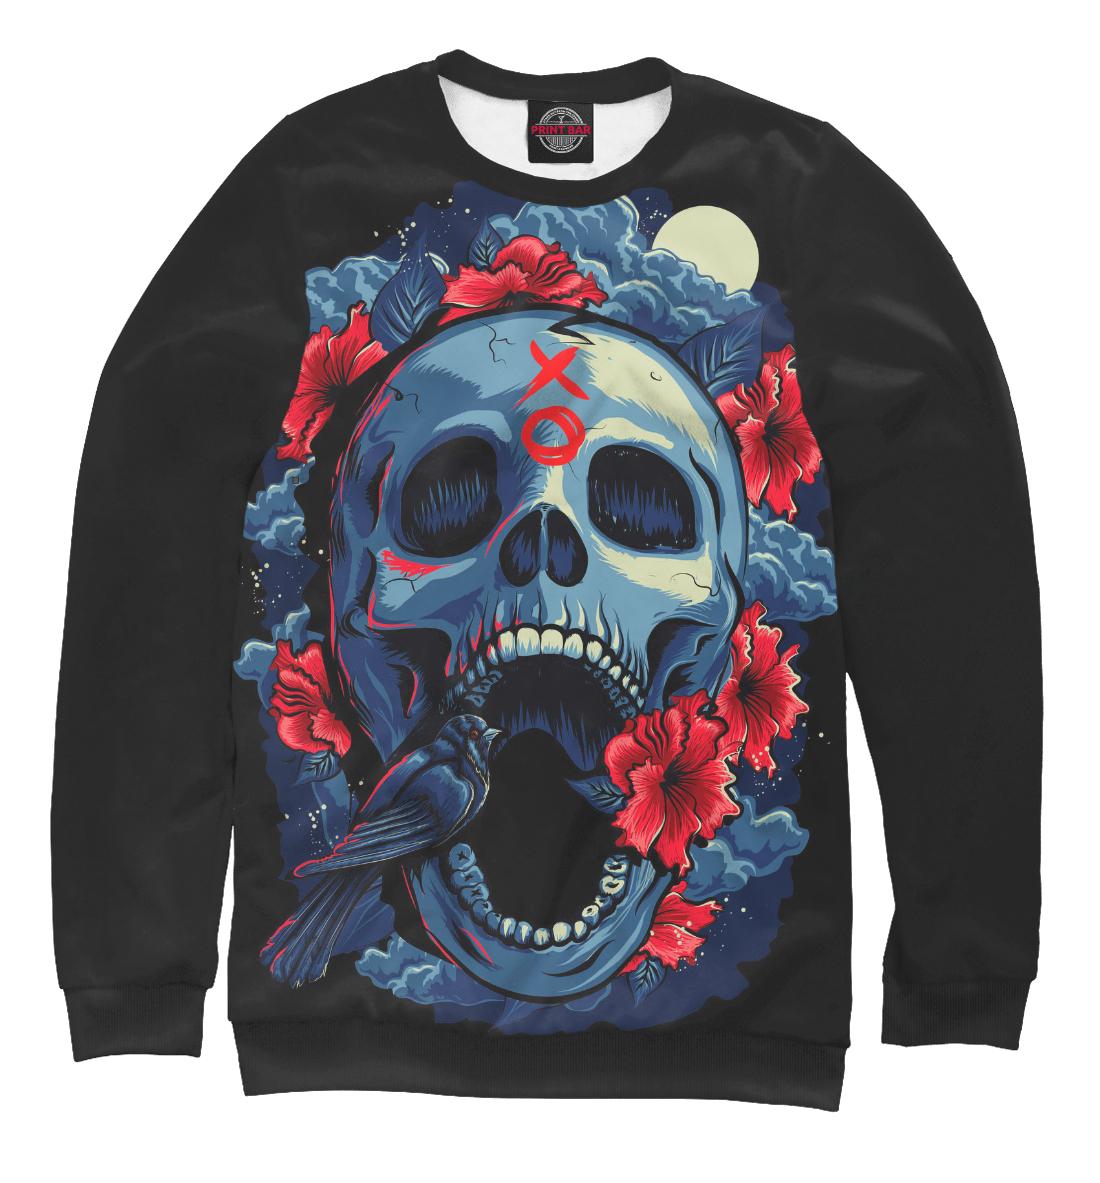 Купить Birdy Skull, Printbar, Свитшоты, HAL-733026-swi-2